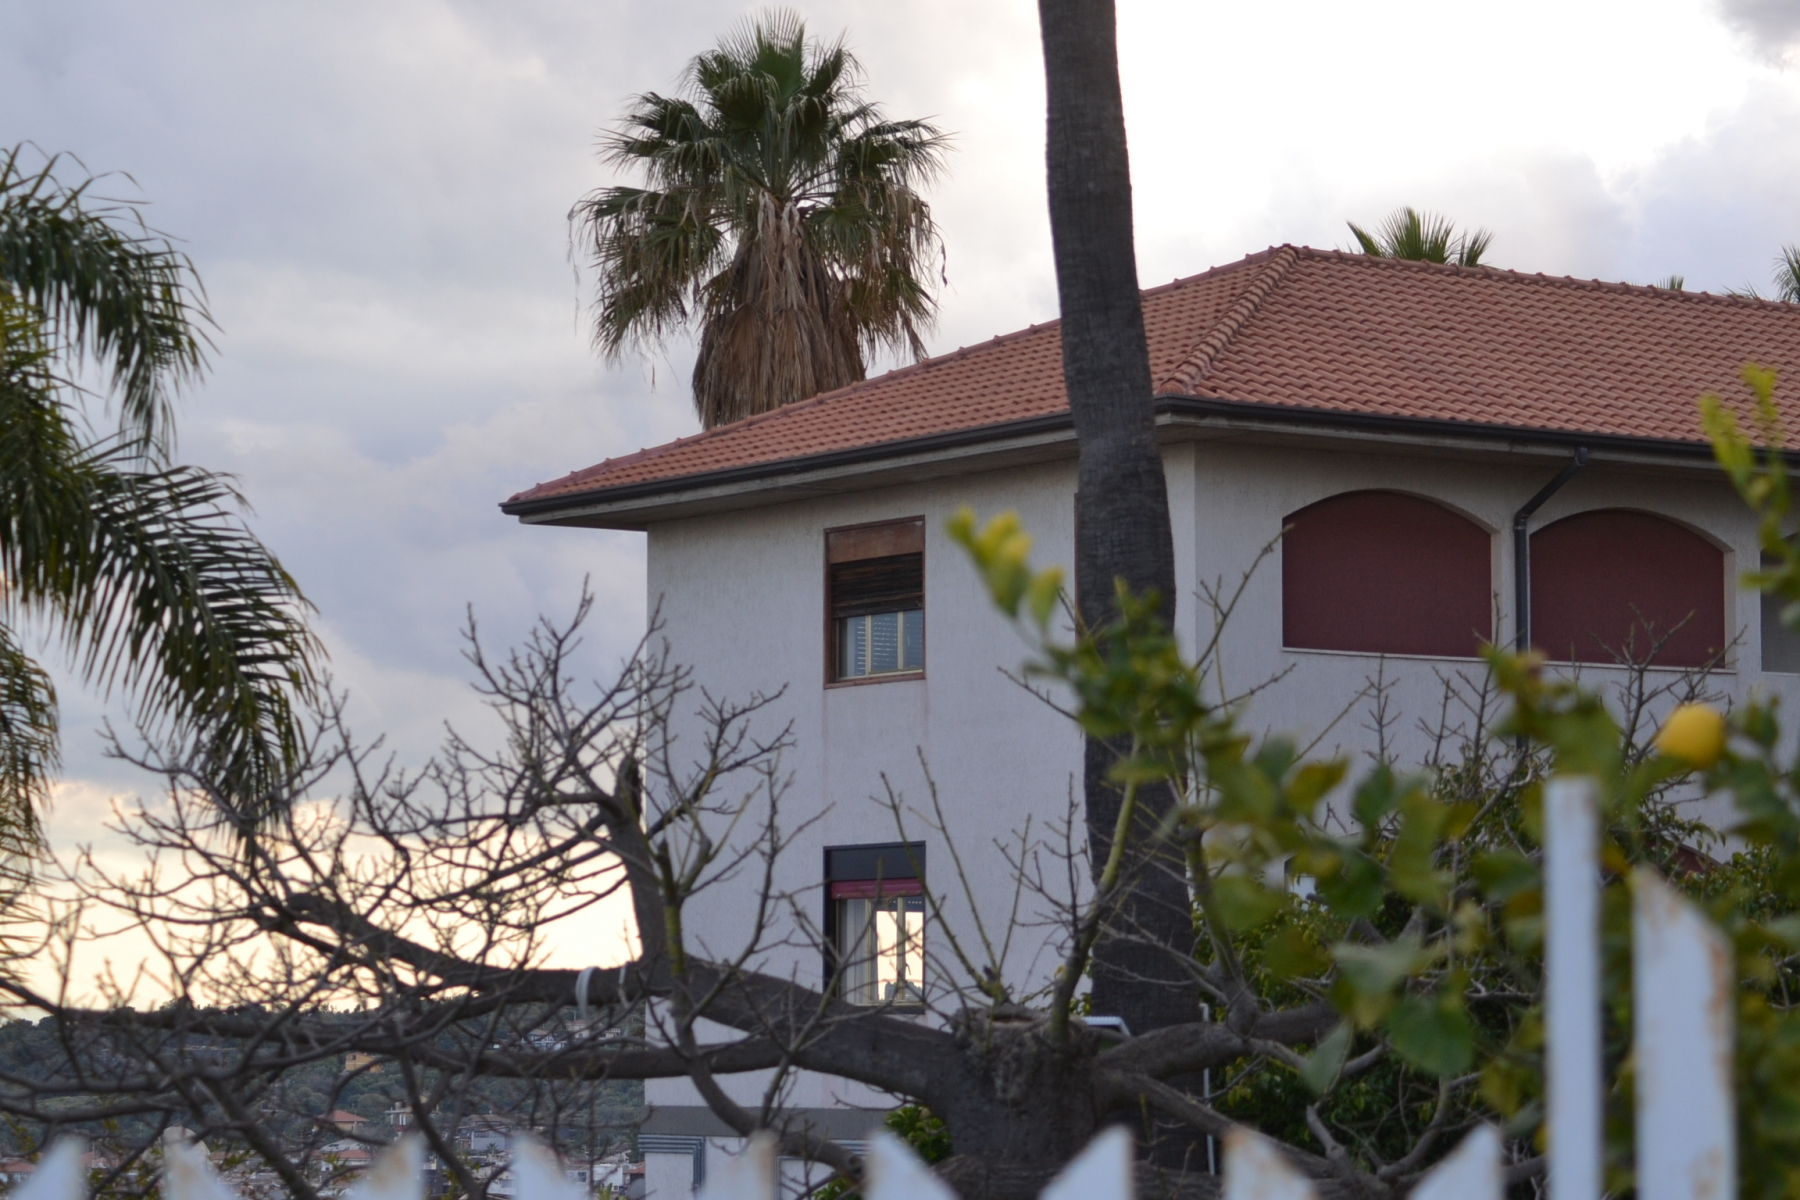 Casa-Nausica-vista-dallesterno